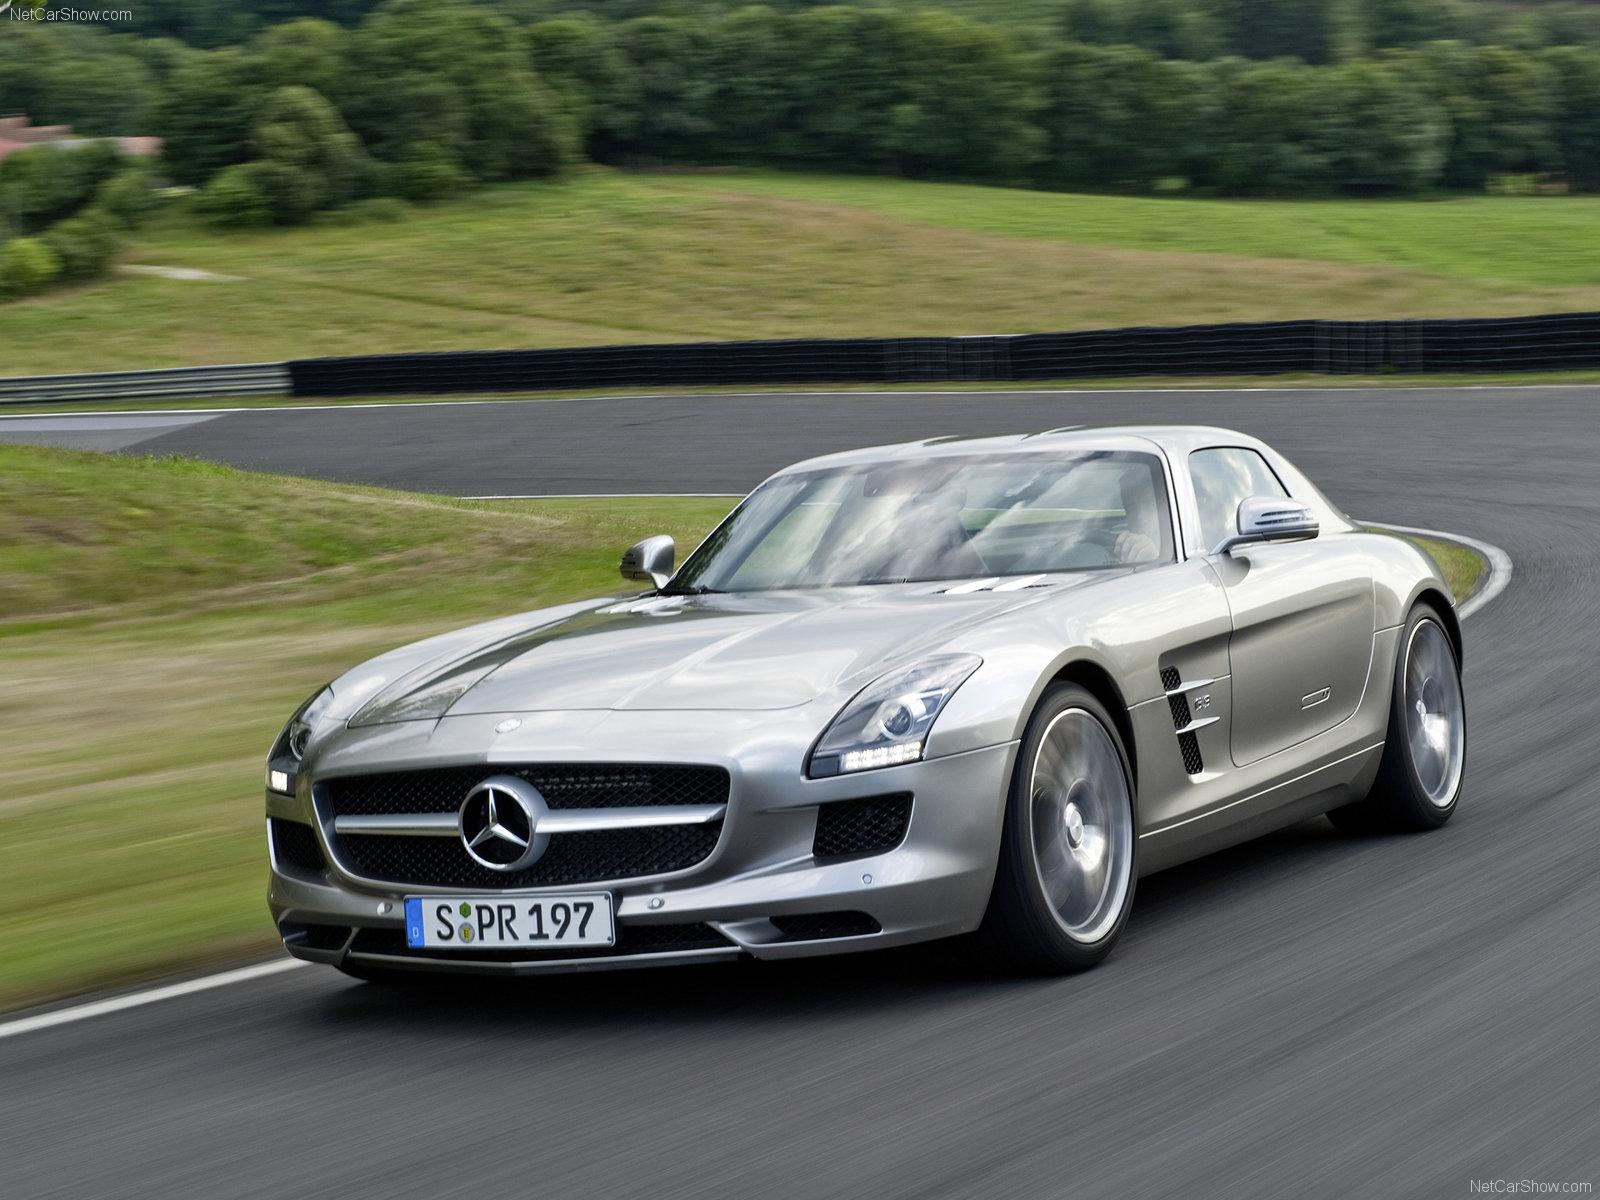 Mercedes Benz Sls Amg Gullwing 2011 Fotos E Im Genes En